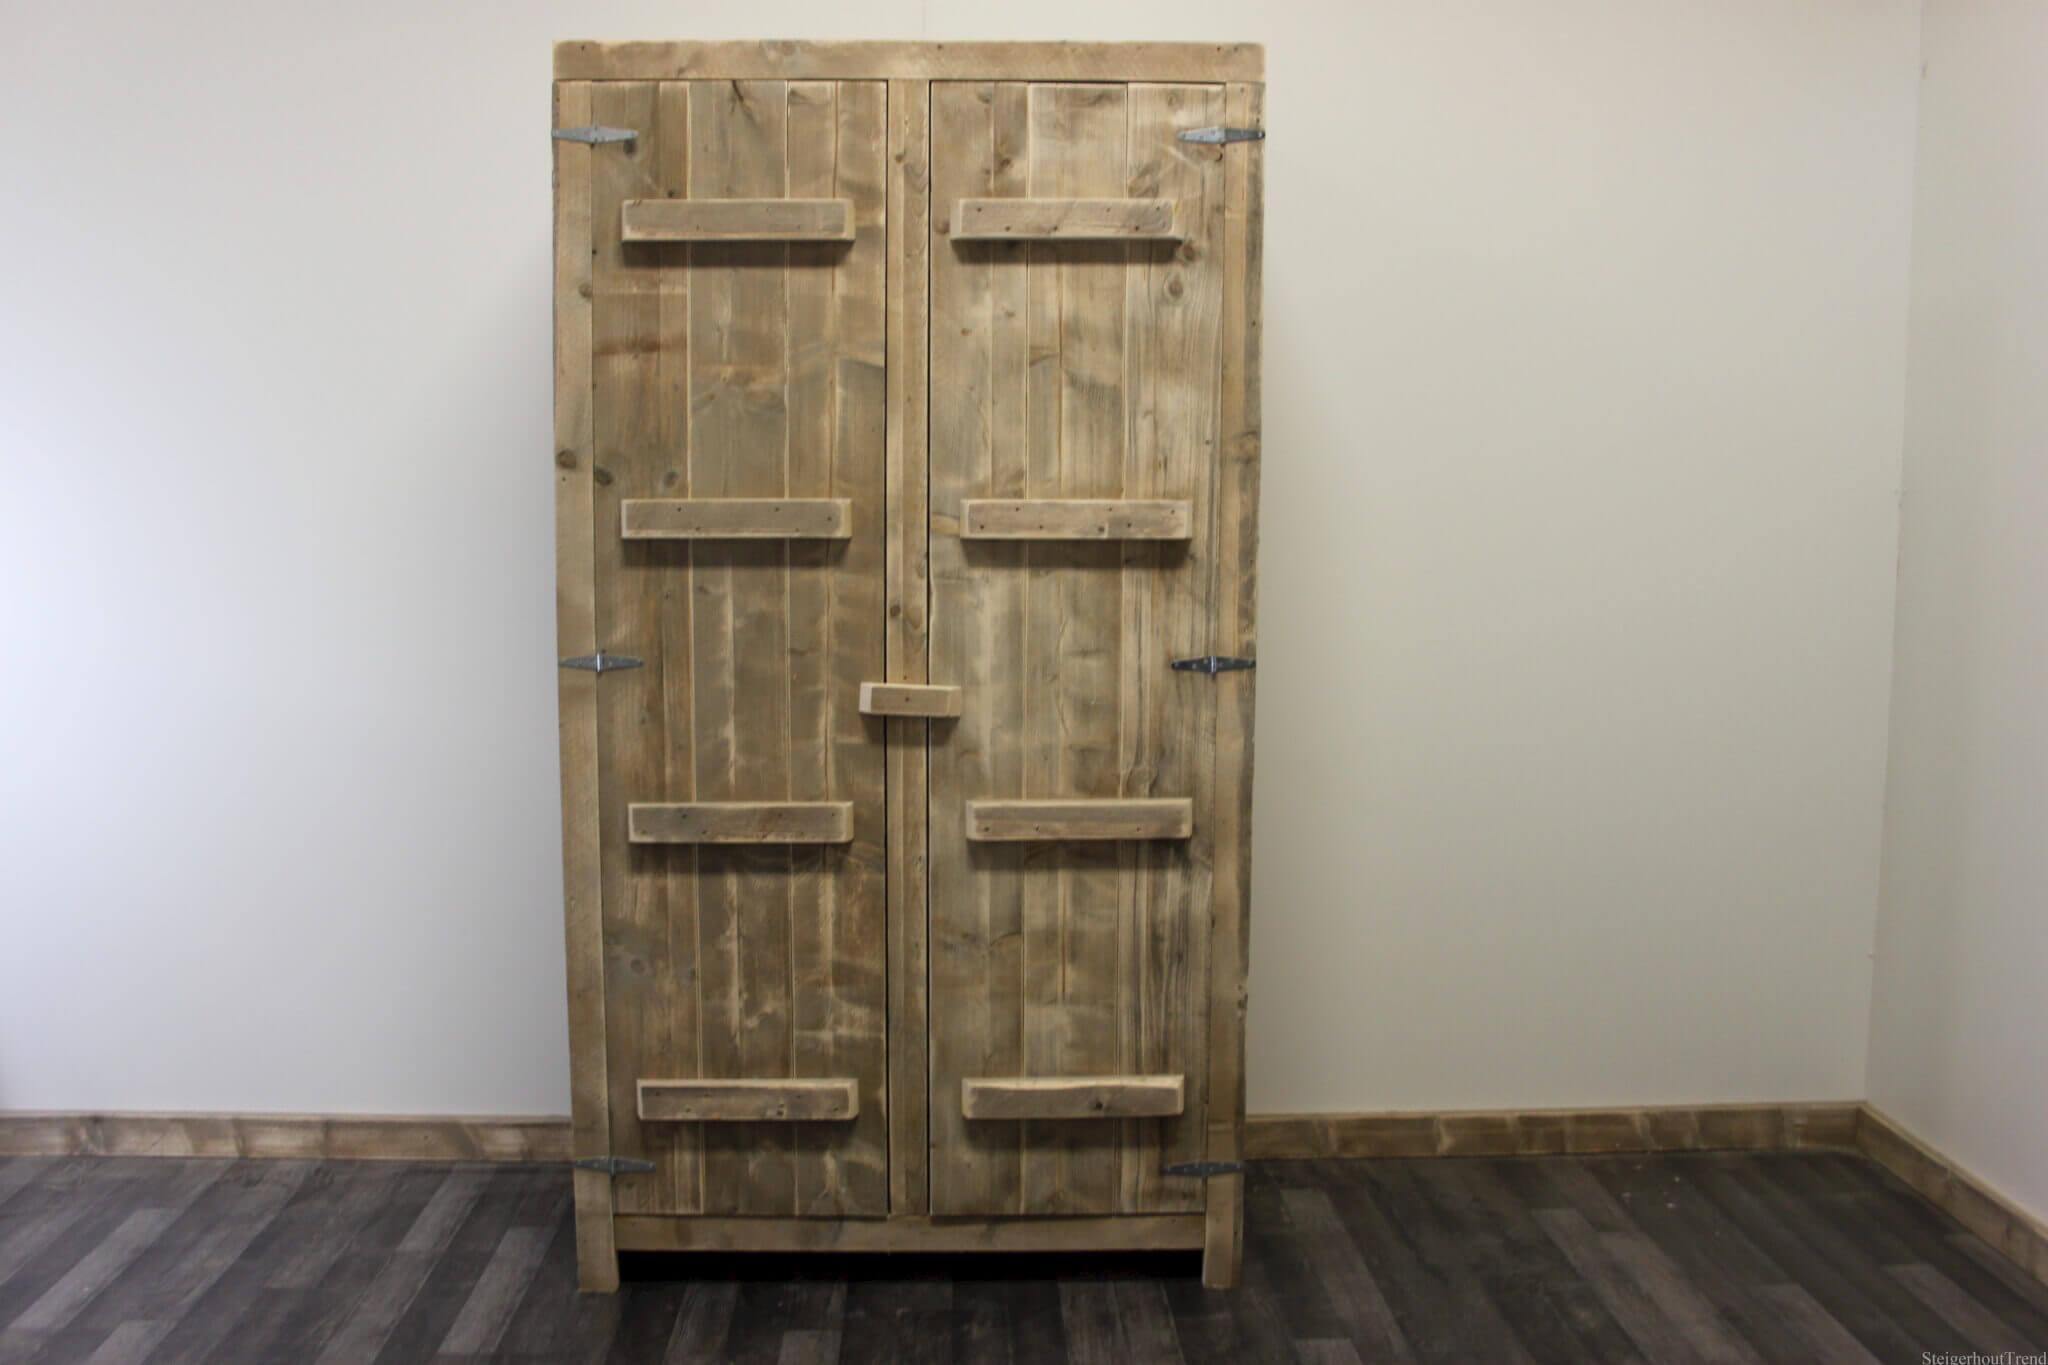 Handgrepen Keuken Bestellen : Steigerhouten kast Linares – SteigerhoutTrend